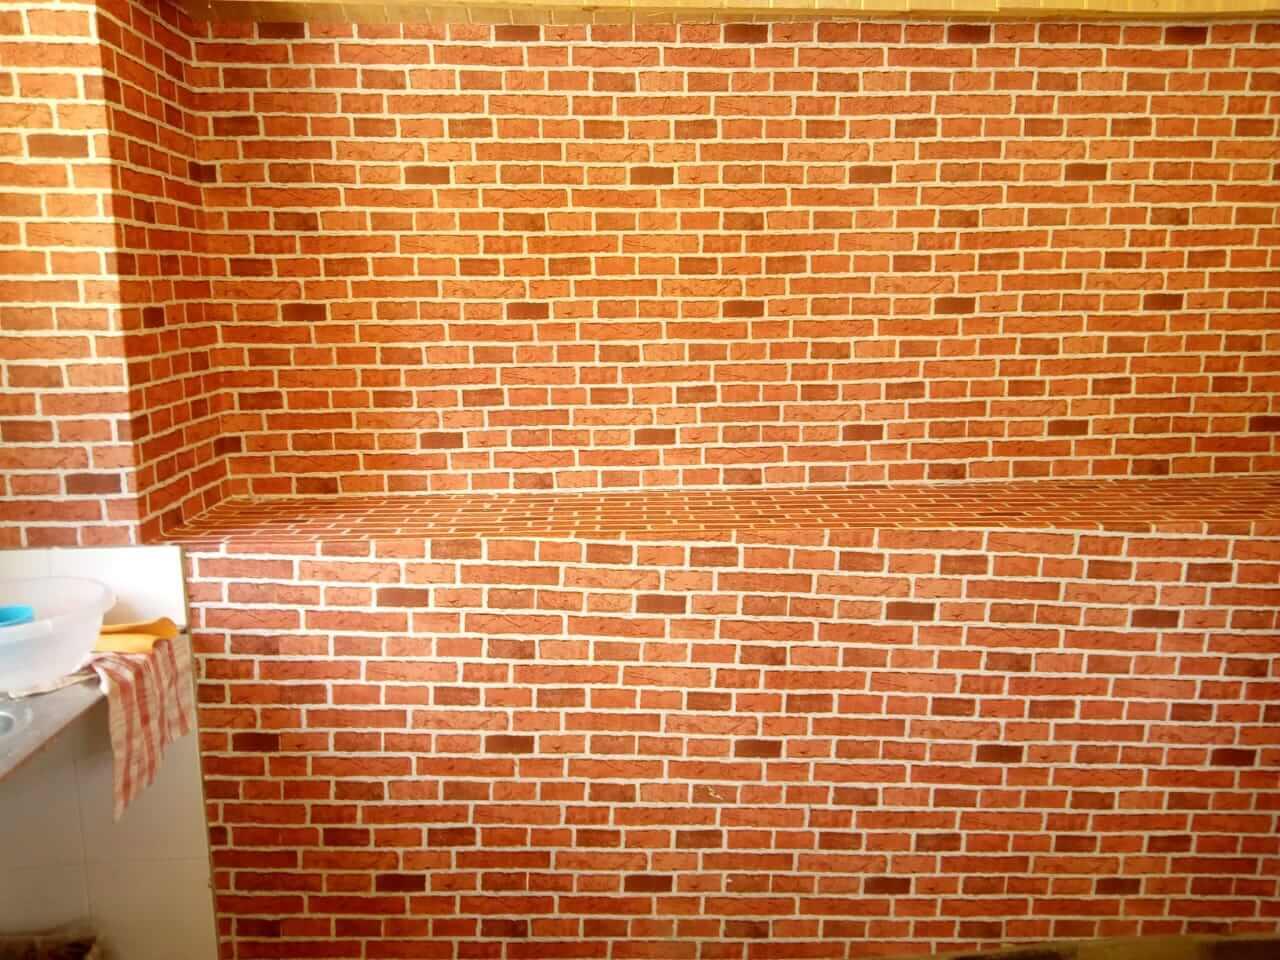 LCPE180-0105 Red Brick Wallpaper - Call: +254741889754 Wallpaper Kenya.